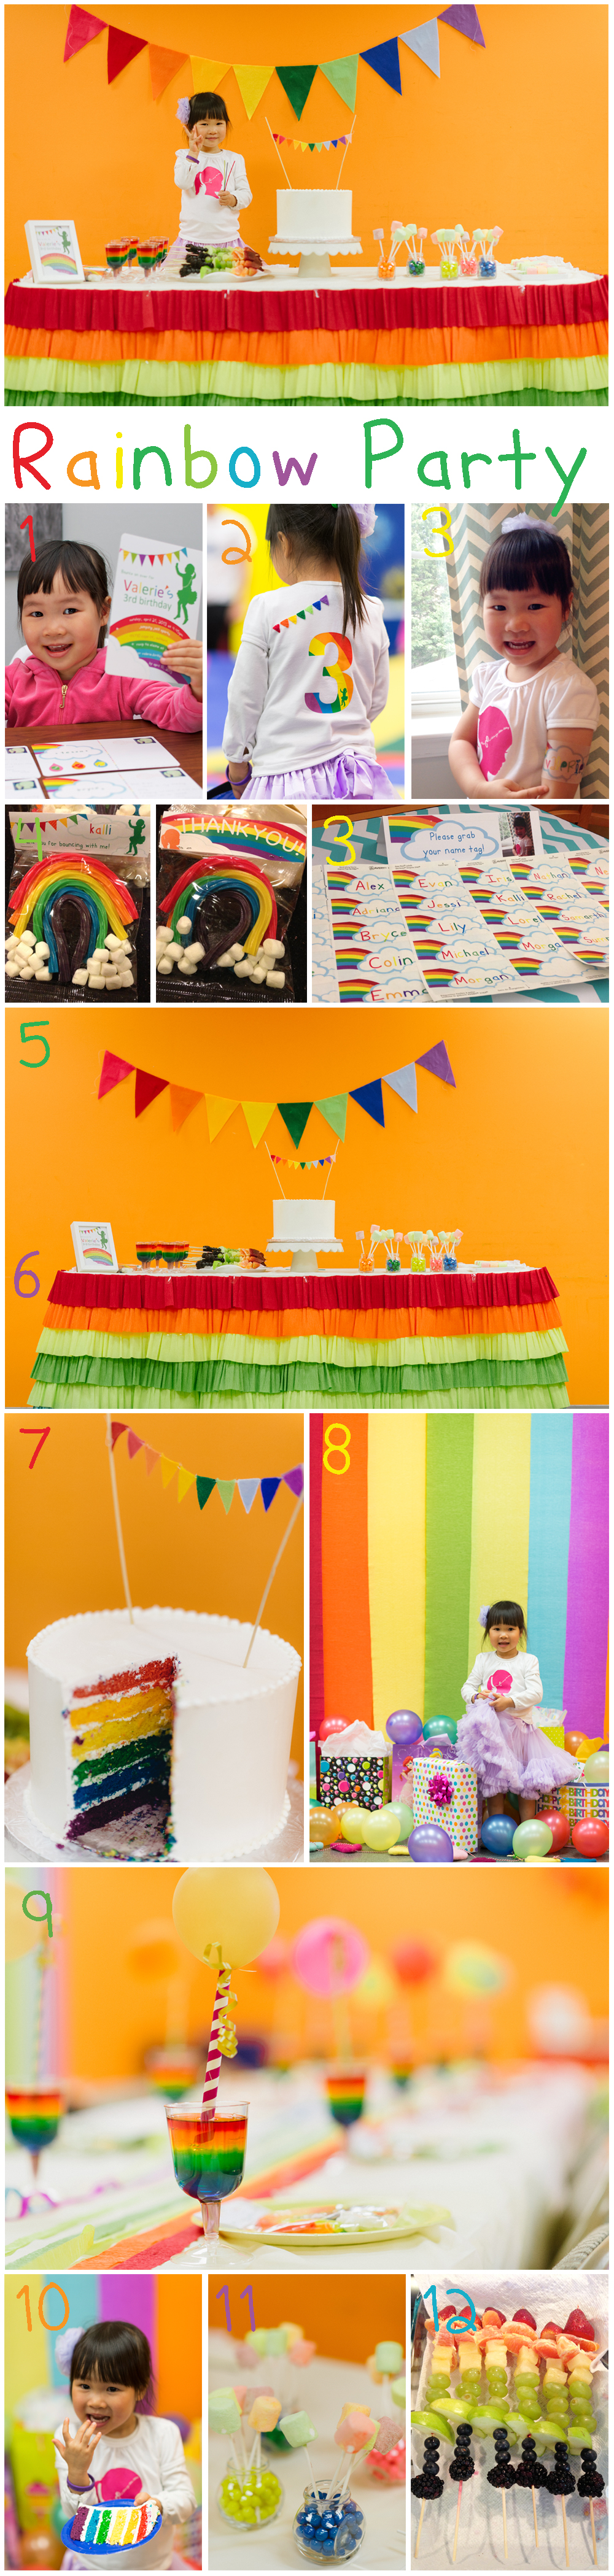 Diy wednesday rainbow party roundup family of love